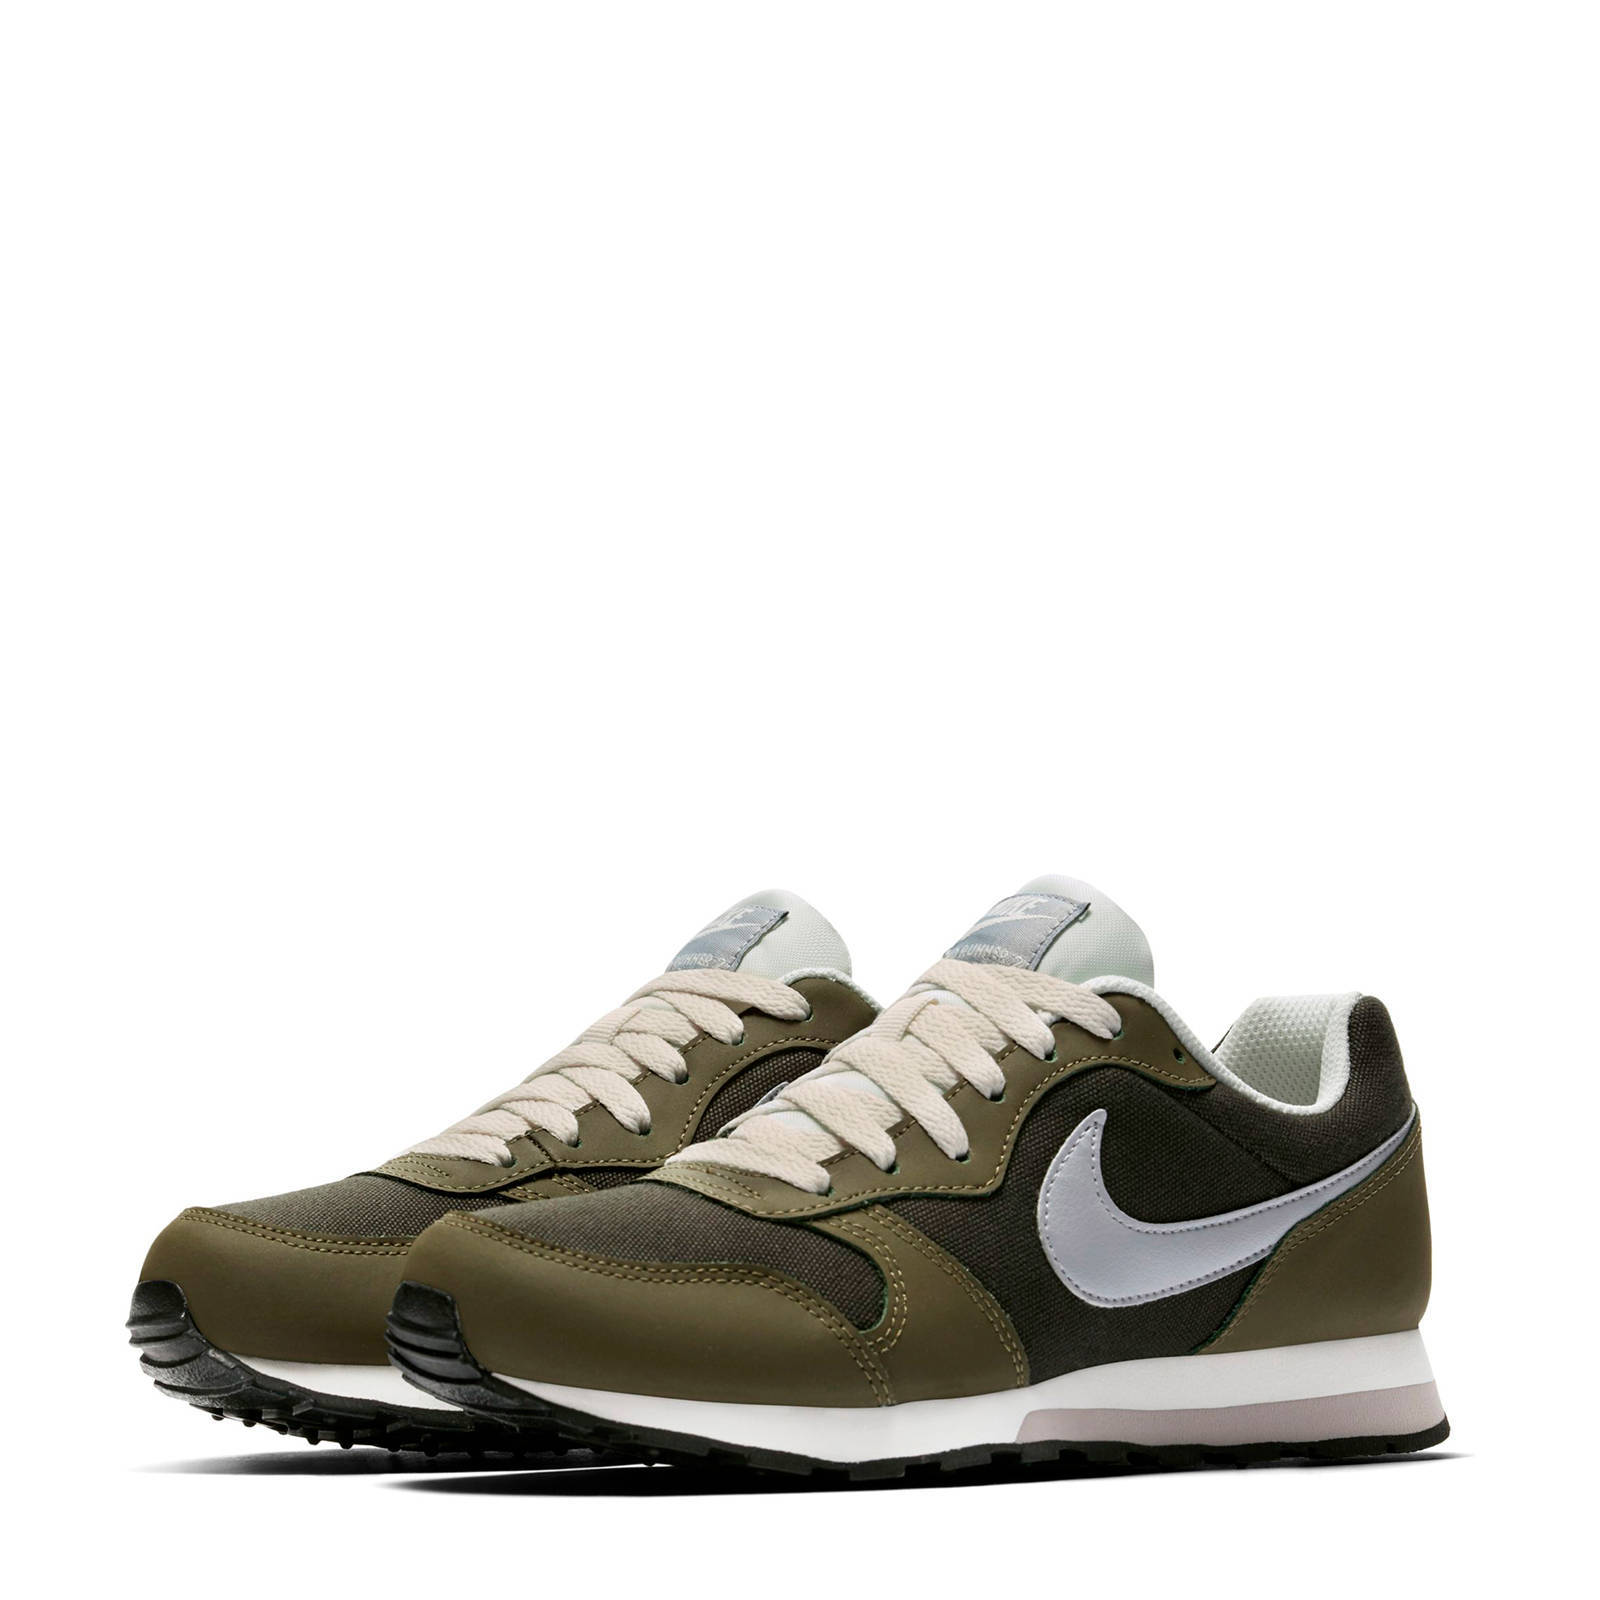 Nike MD Runner 2 (GS) sneakers groenolijfgroen | wehkamp